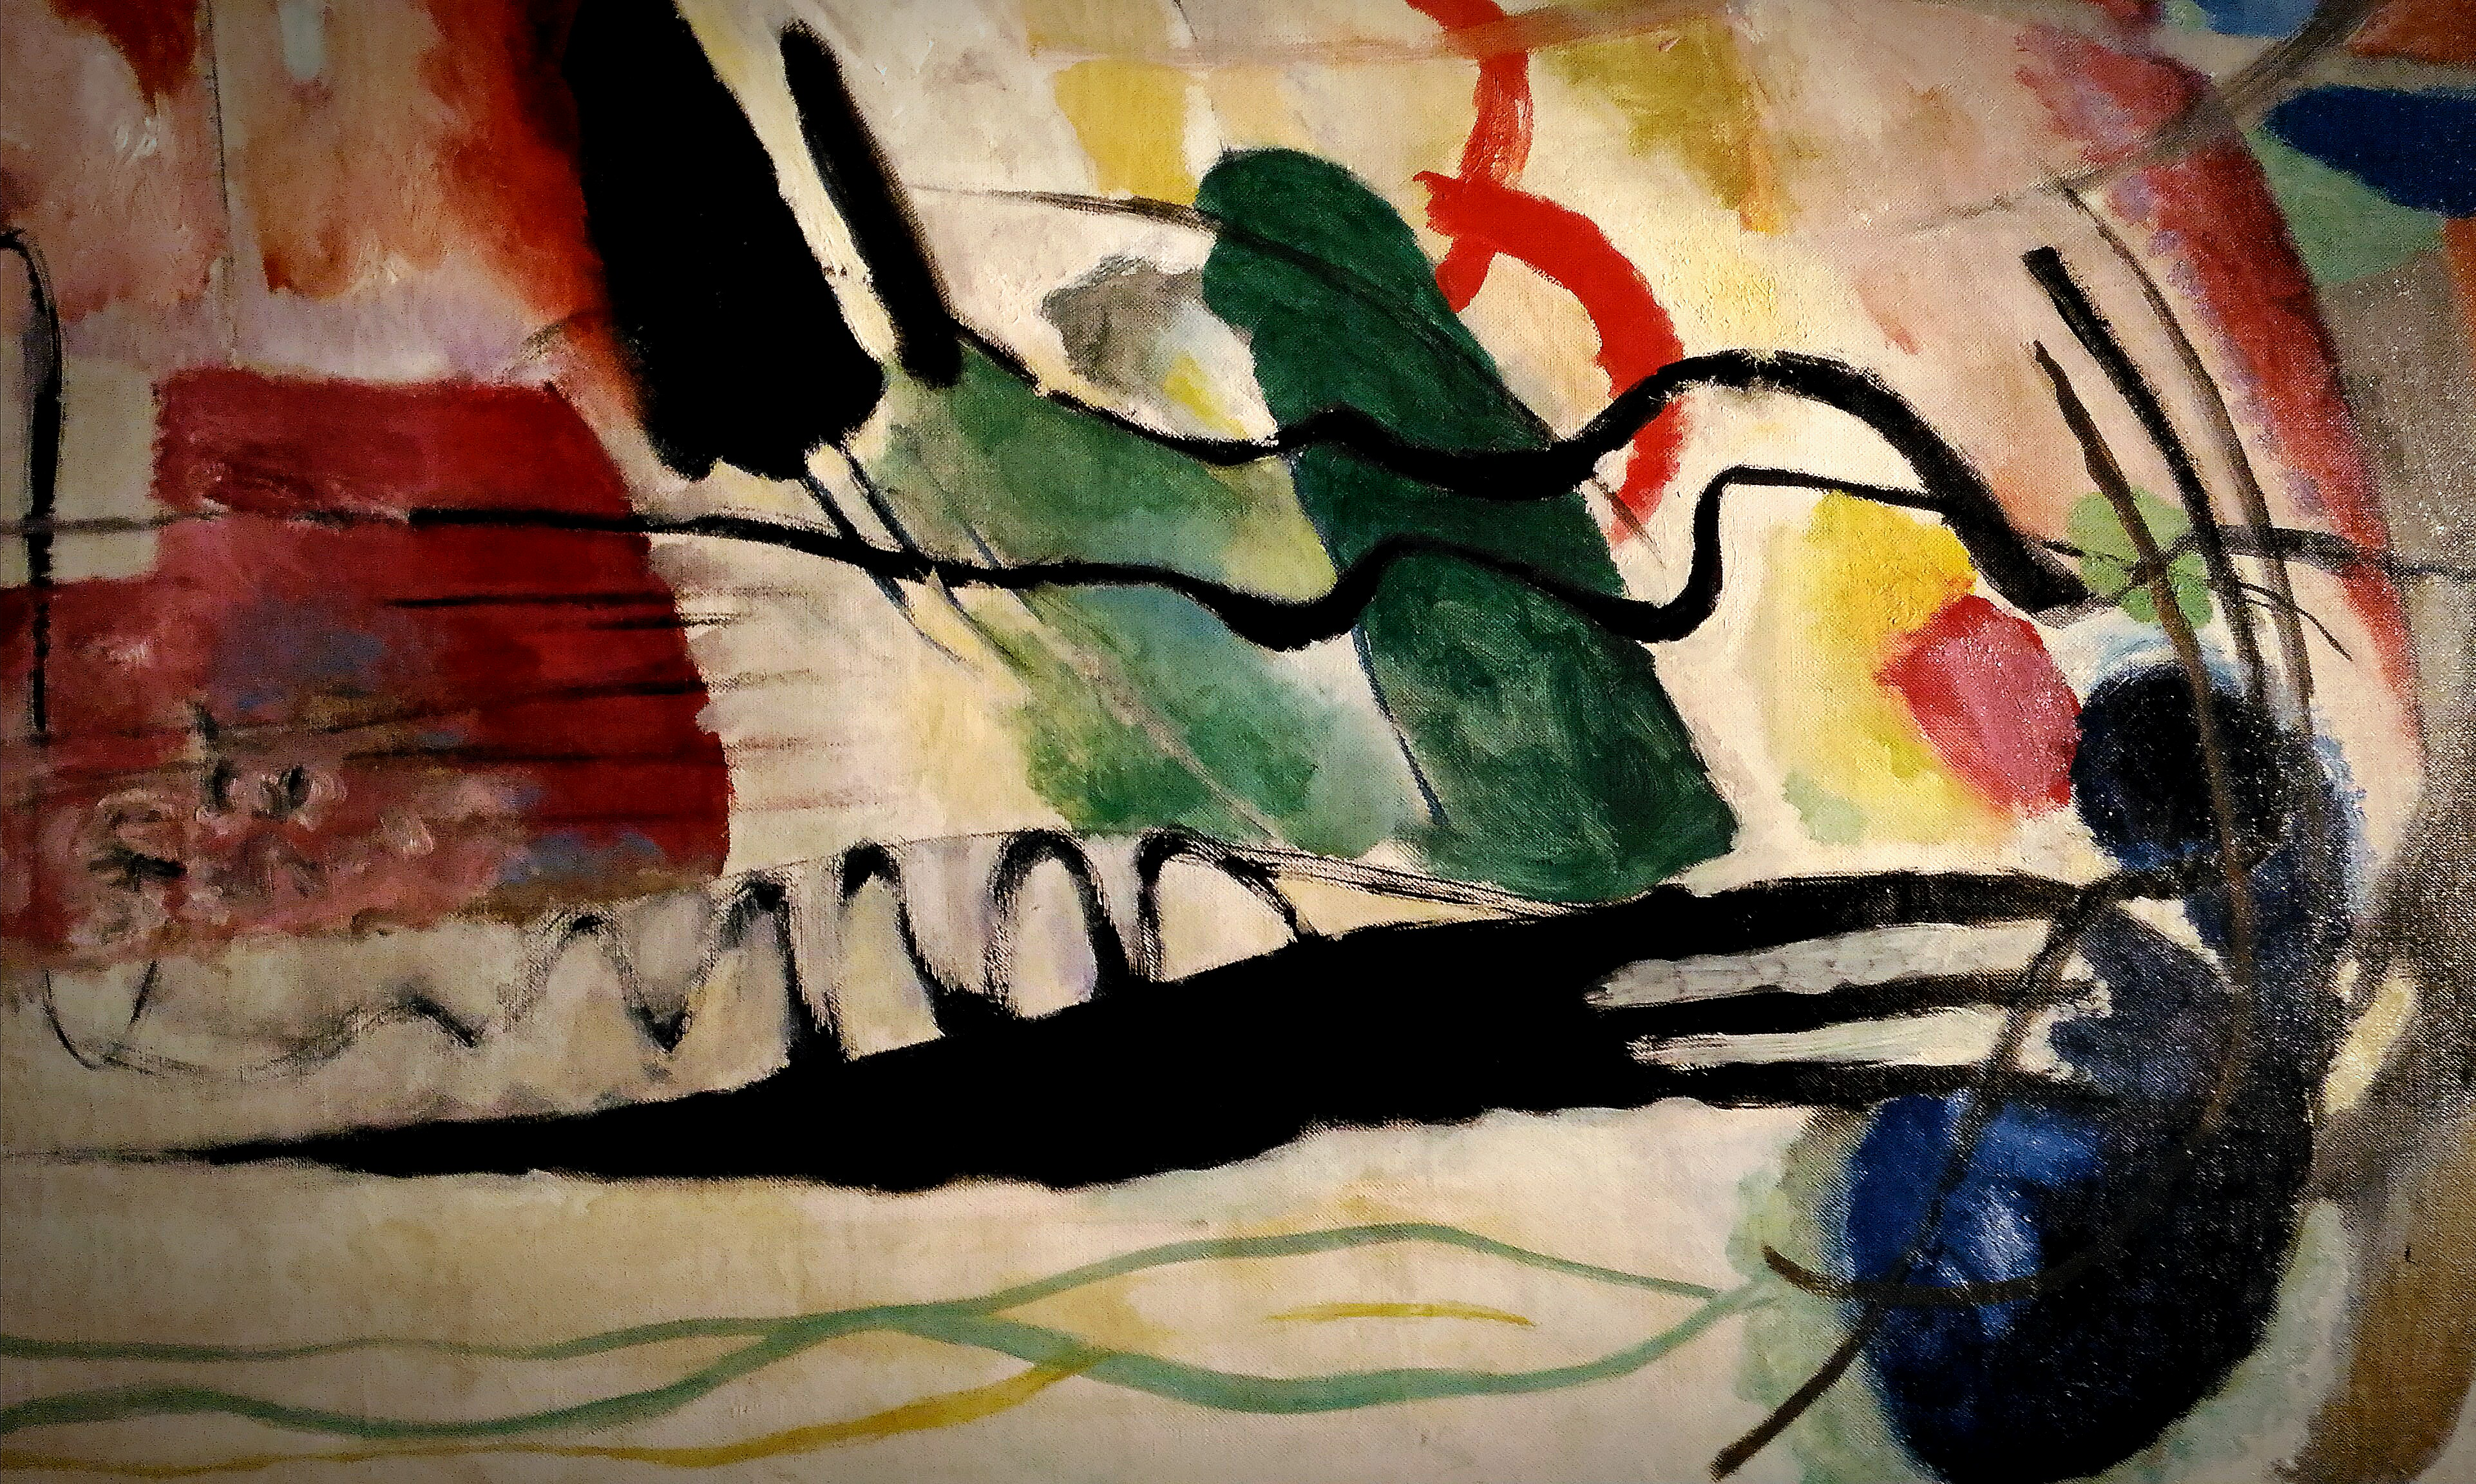 wassily kandinsky steckbrief promi geburtstagede - Wassily Kandinsky Lebenslauf